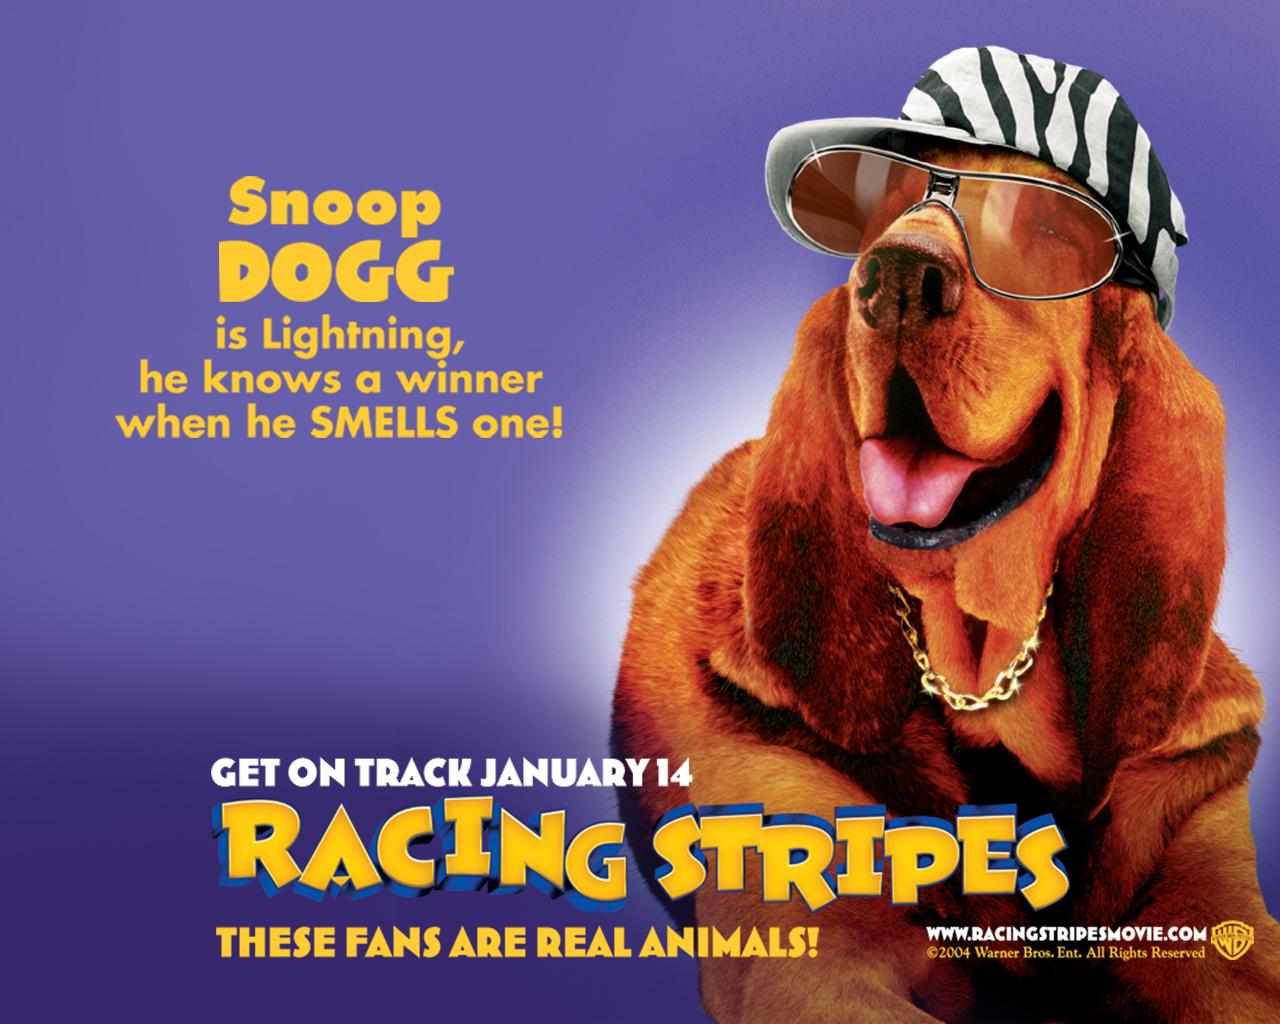 Racing stripes 7